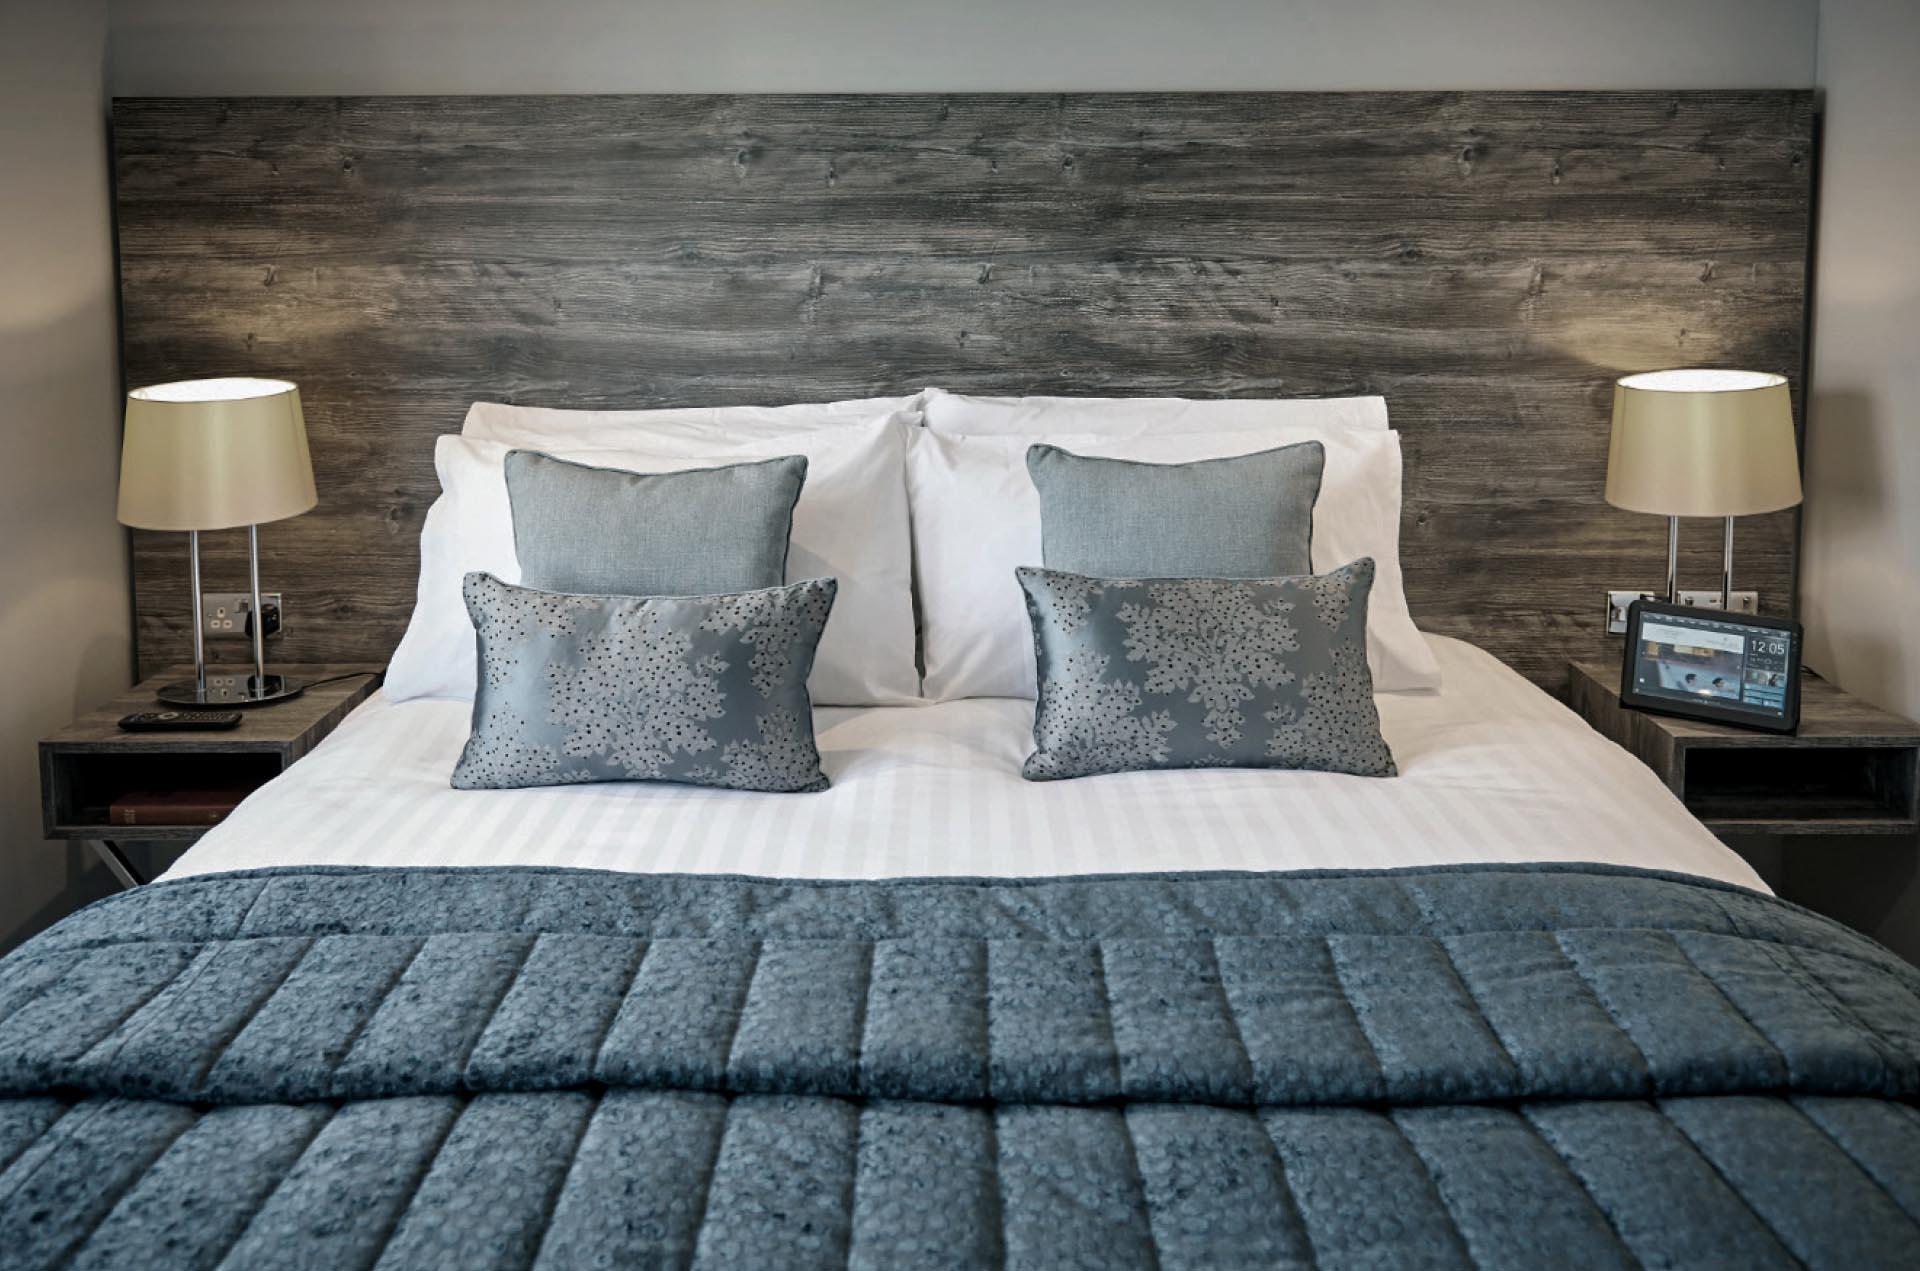 wyboston-hotel-design-interior